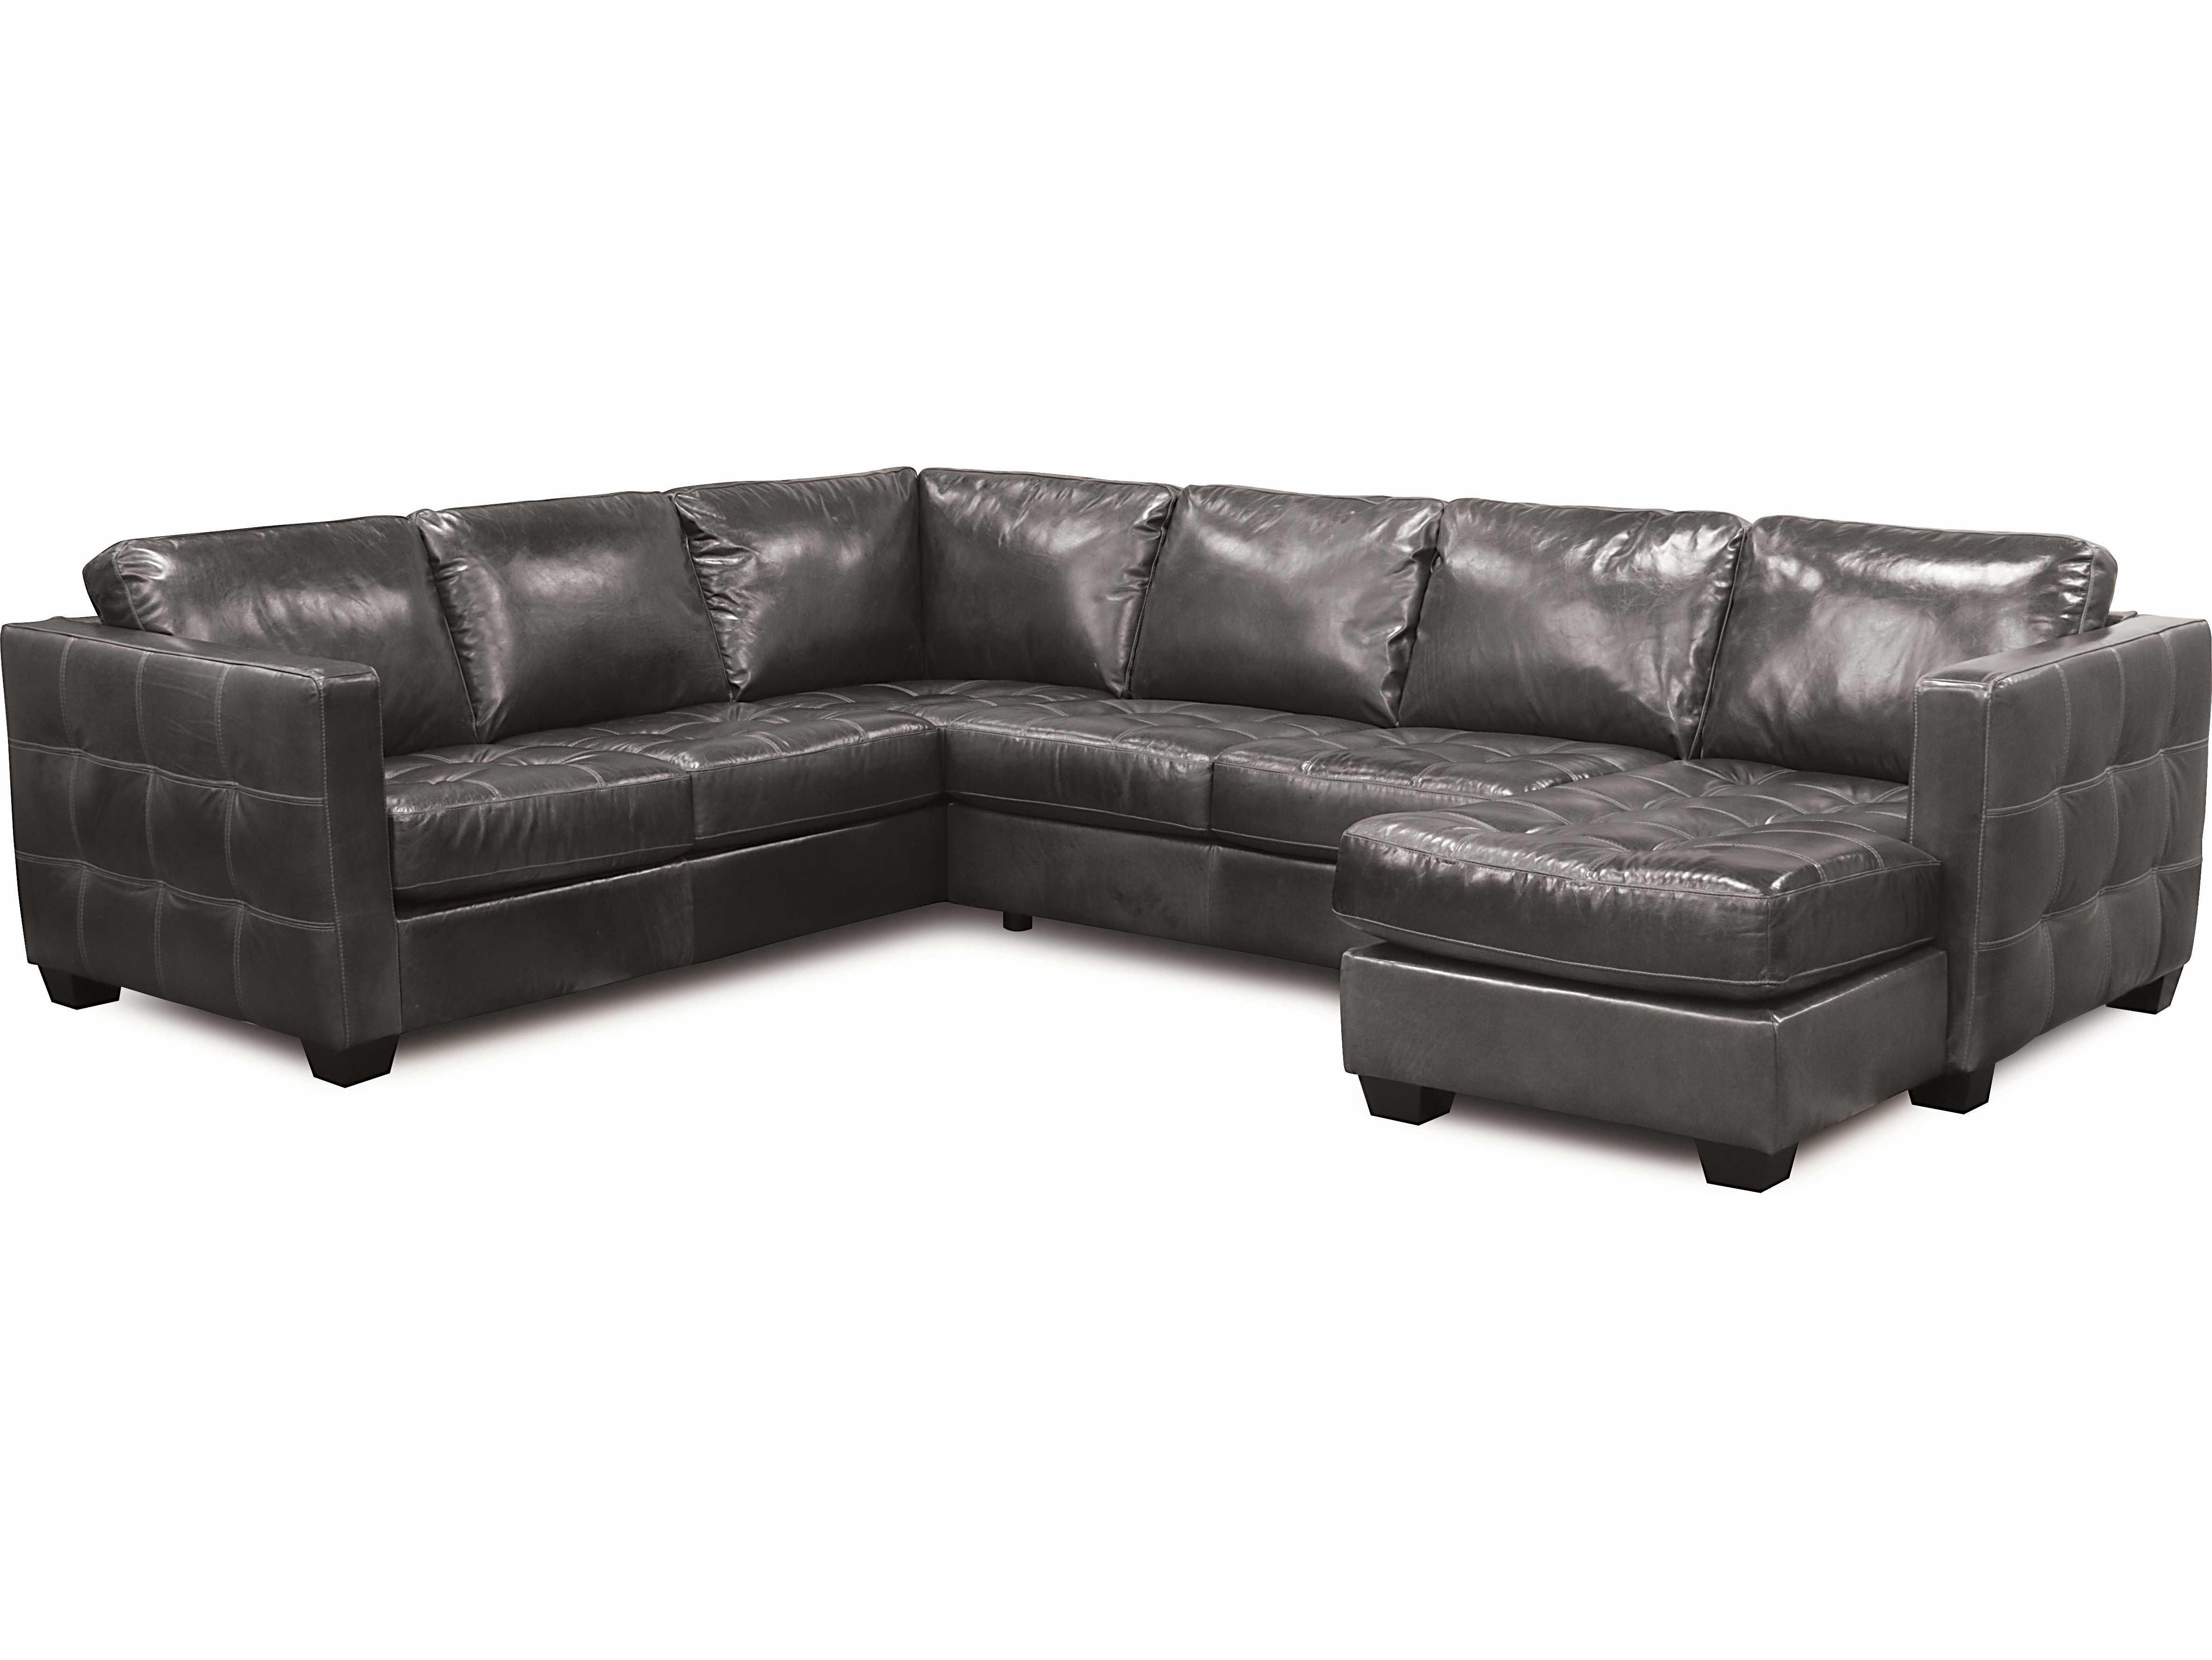 palliser chair and ottoman electric lift recliner sale barrett sofa leather thesofa